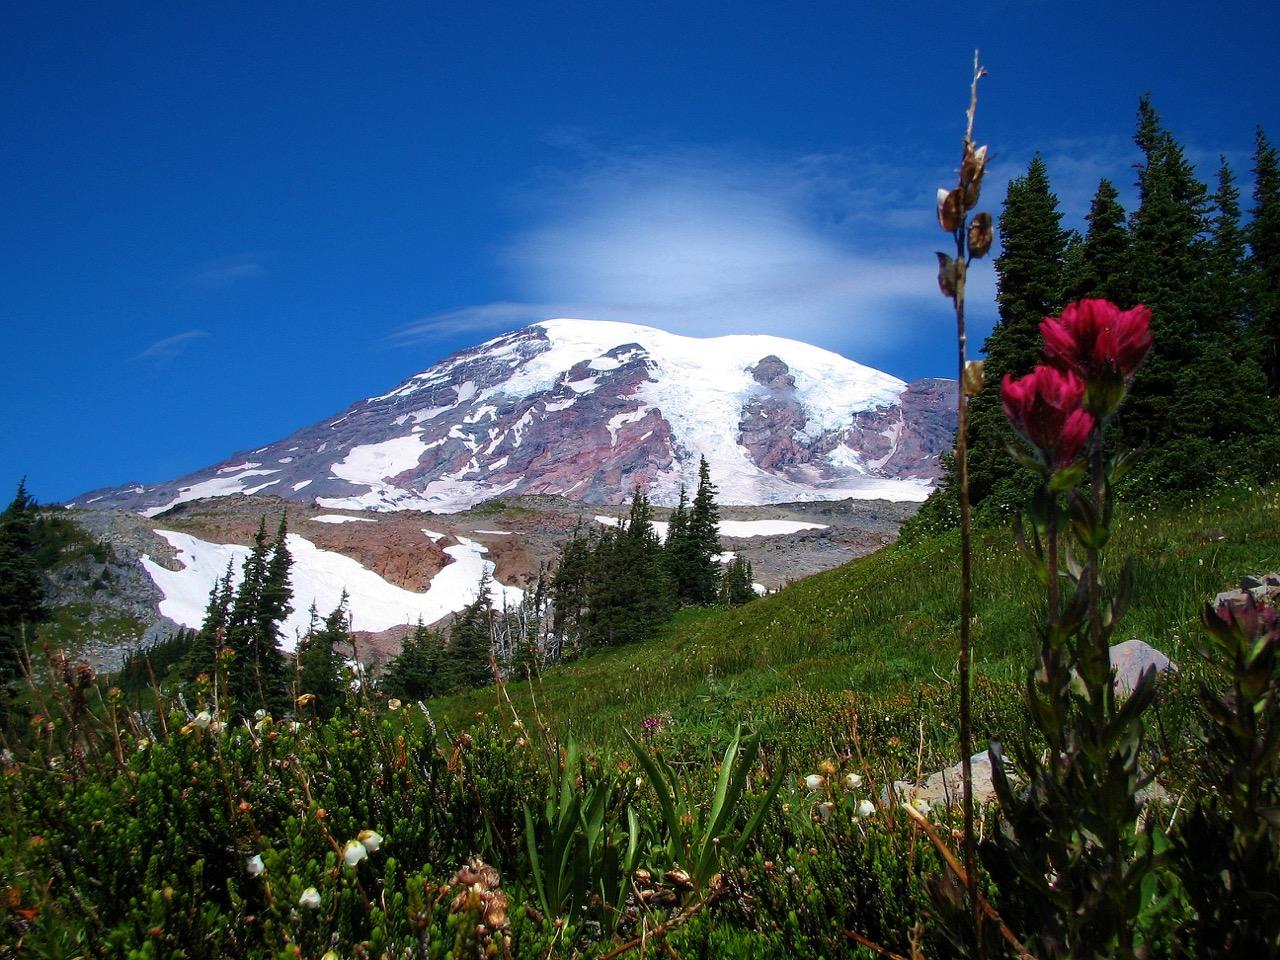 Skyline Trail Mount Rainier